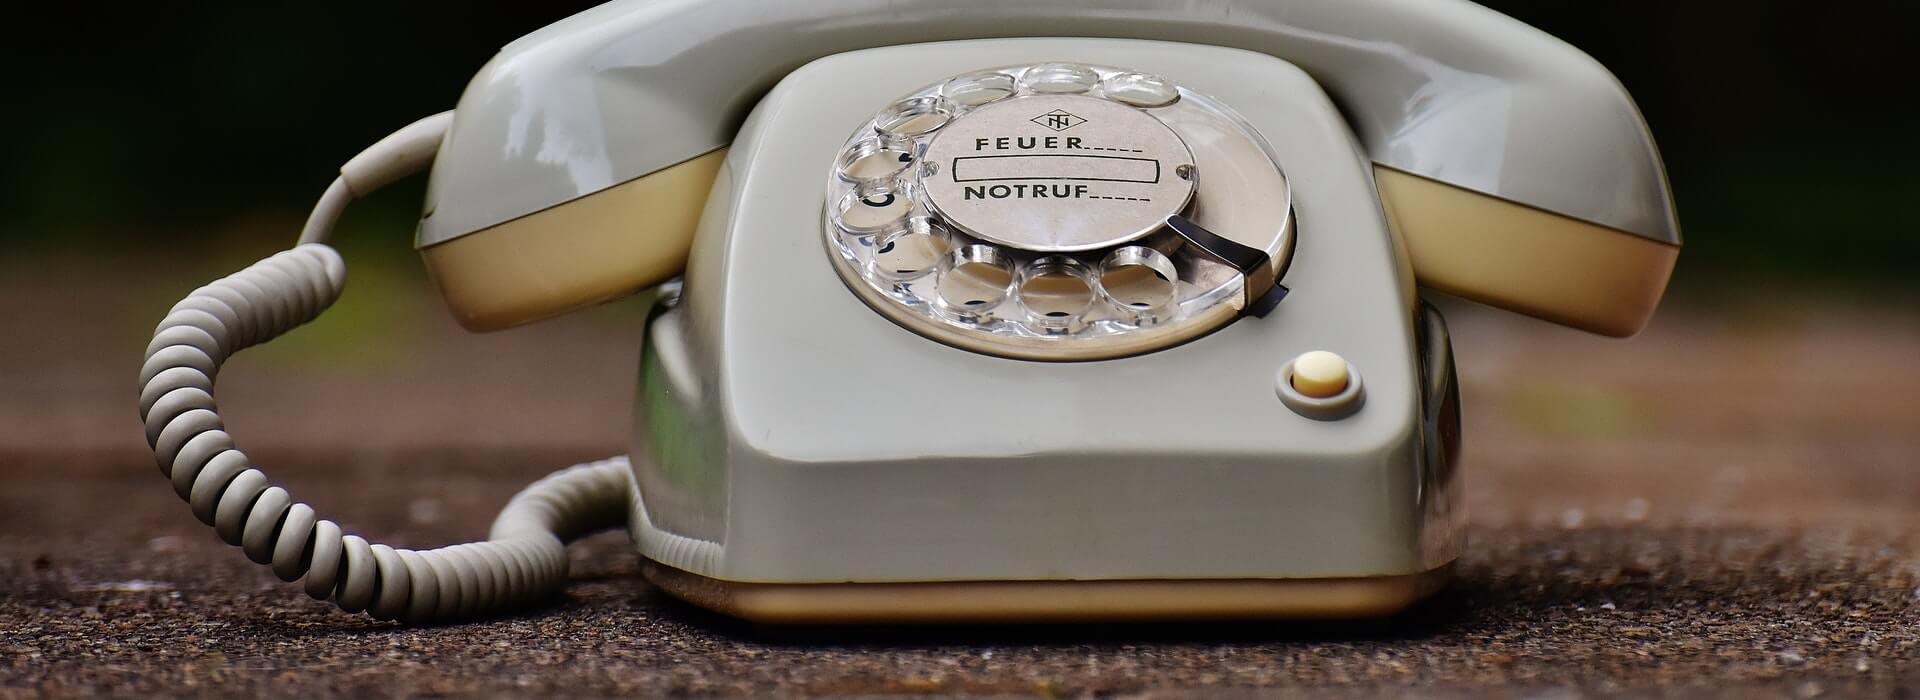 Corona-Covis-19-Hilfsangebot-Telefonnummer-Hotline